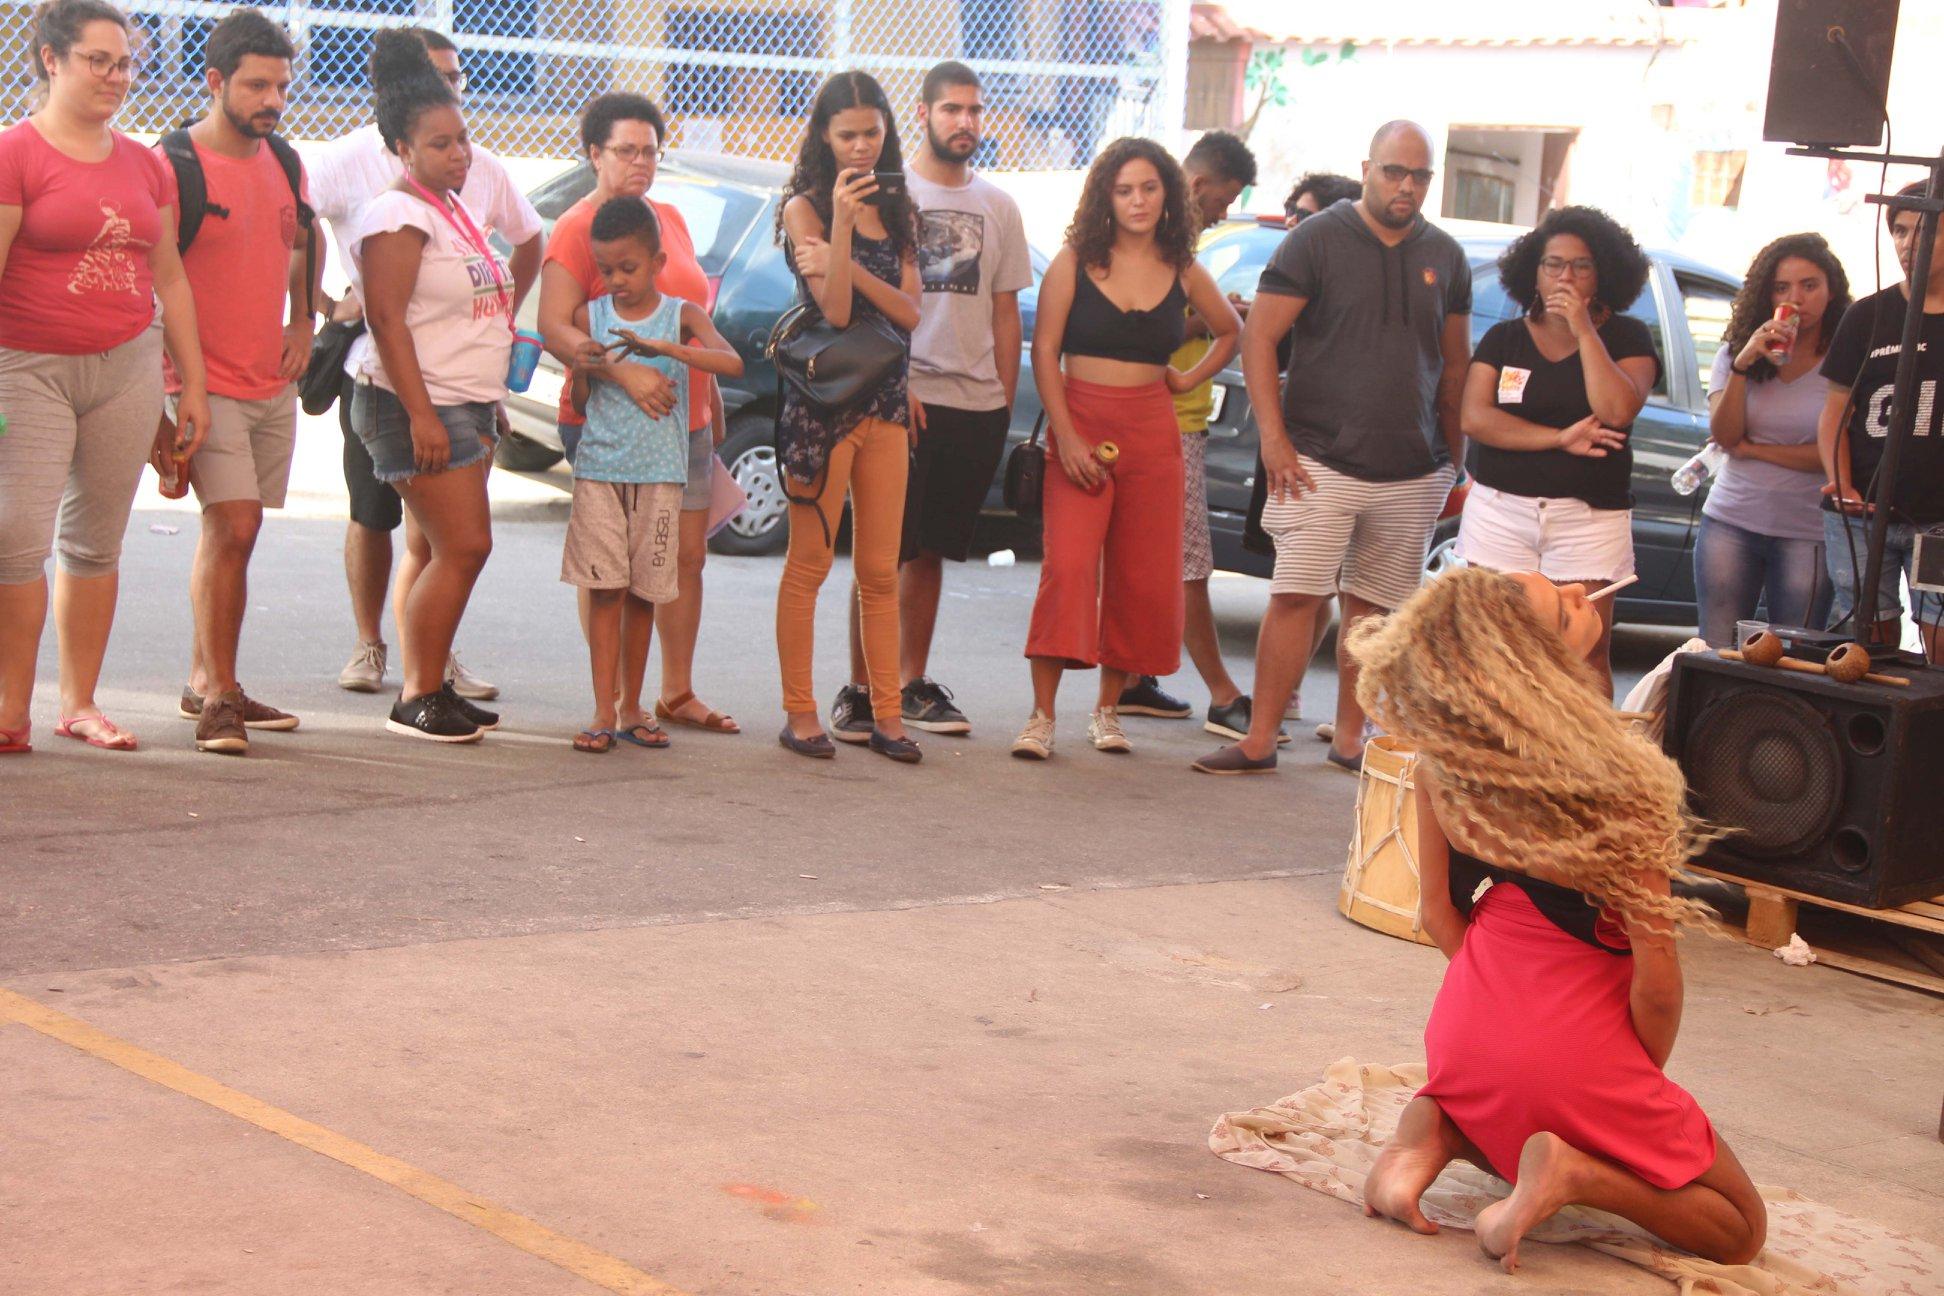 Photo credit: Hector Santos/Raízes em Movimento